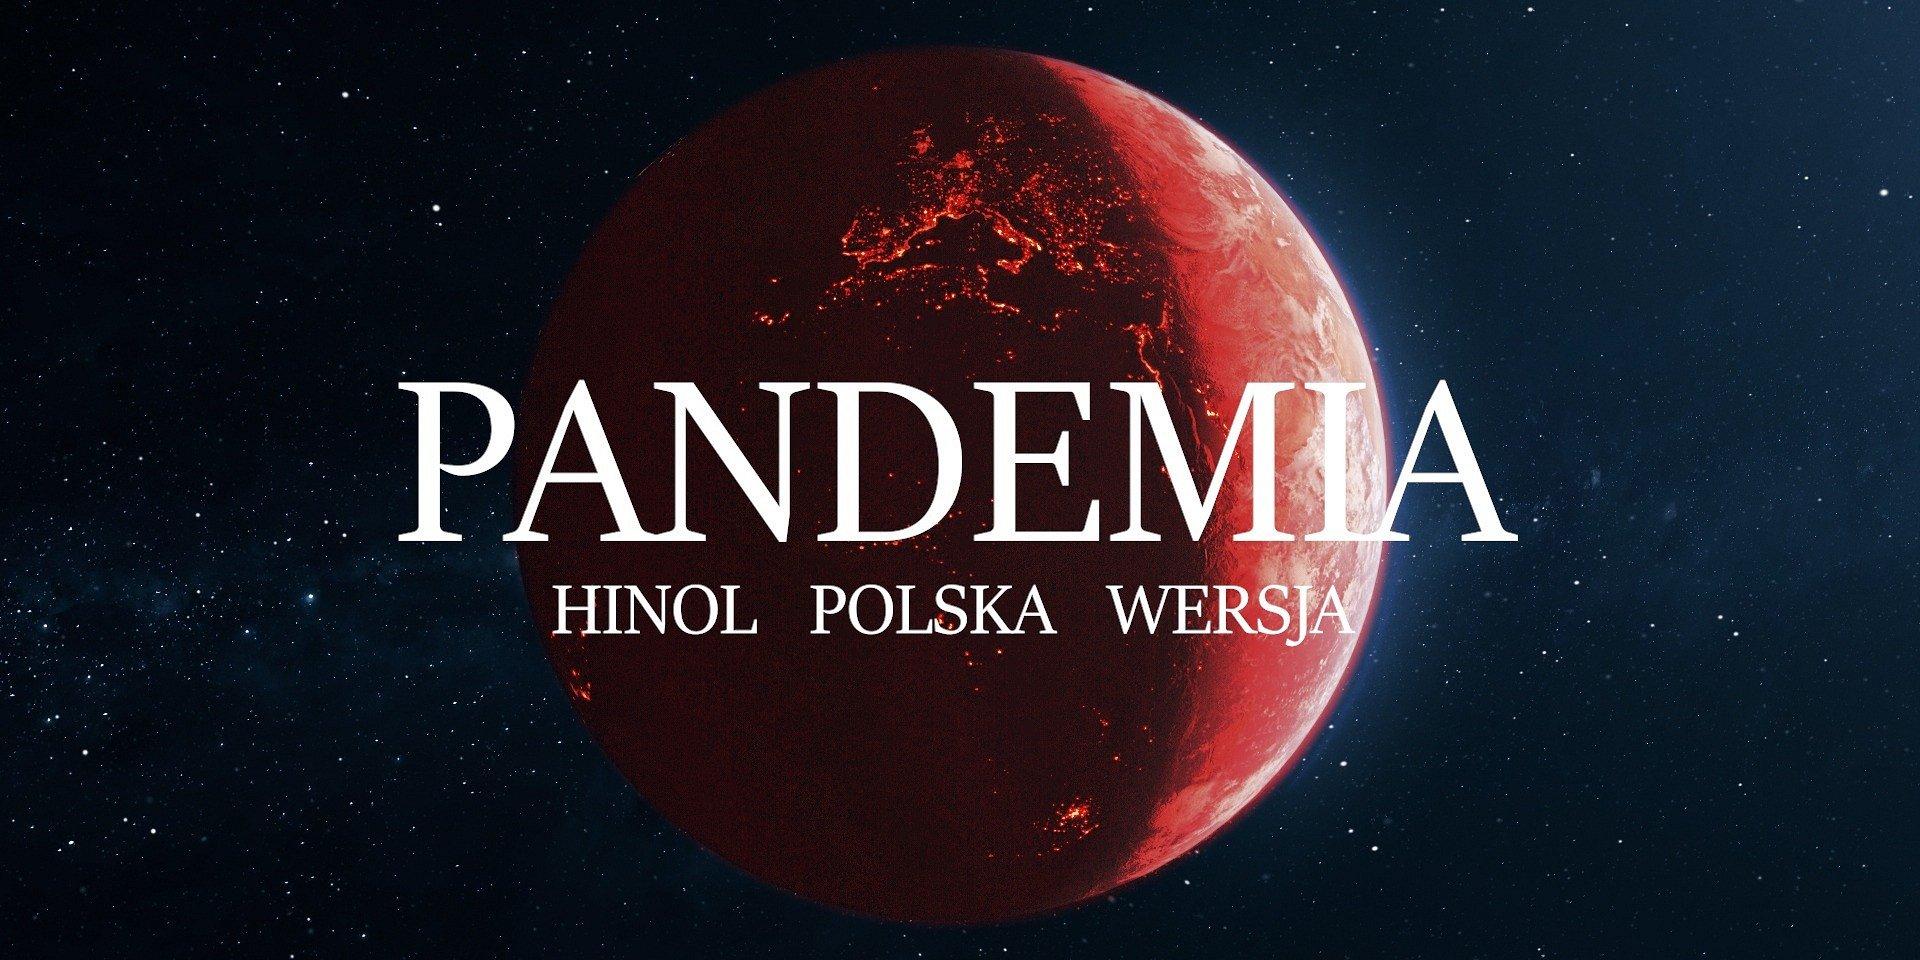 HINOL Polska Wersja - Pandemia